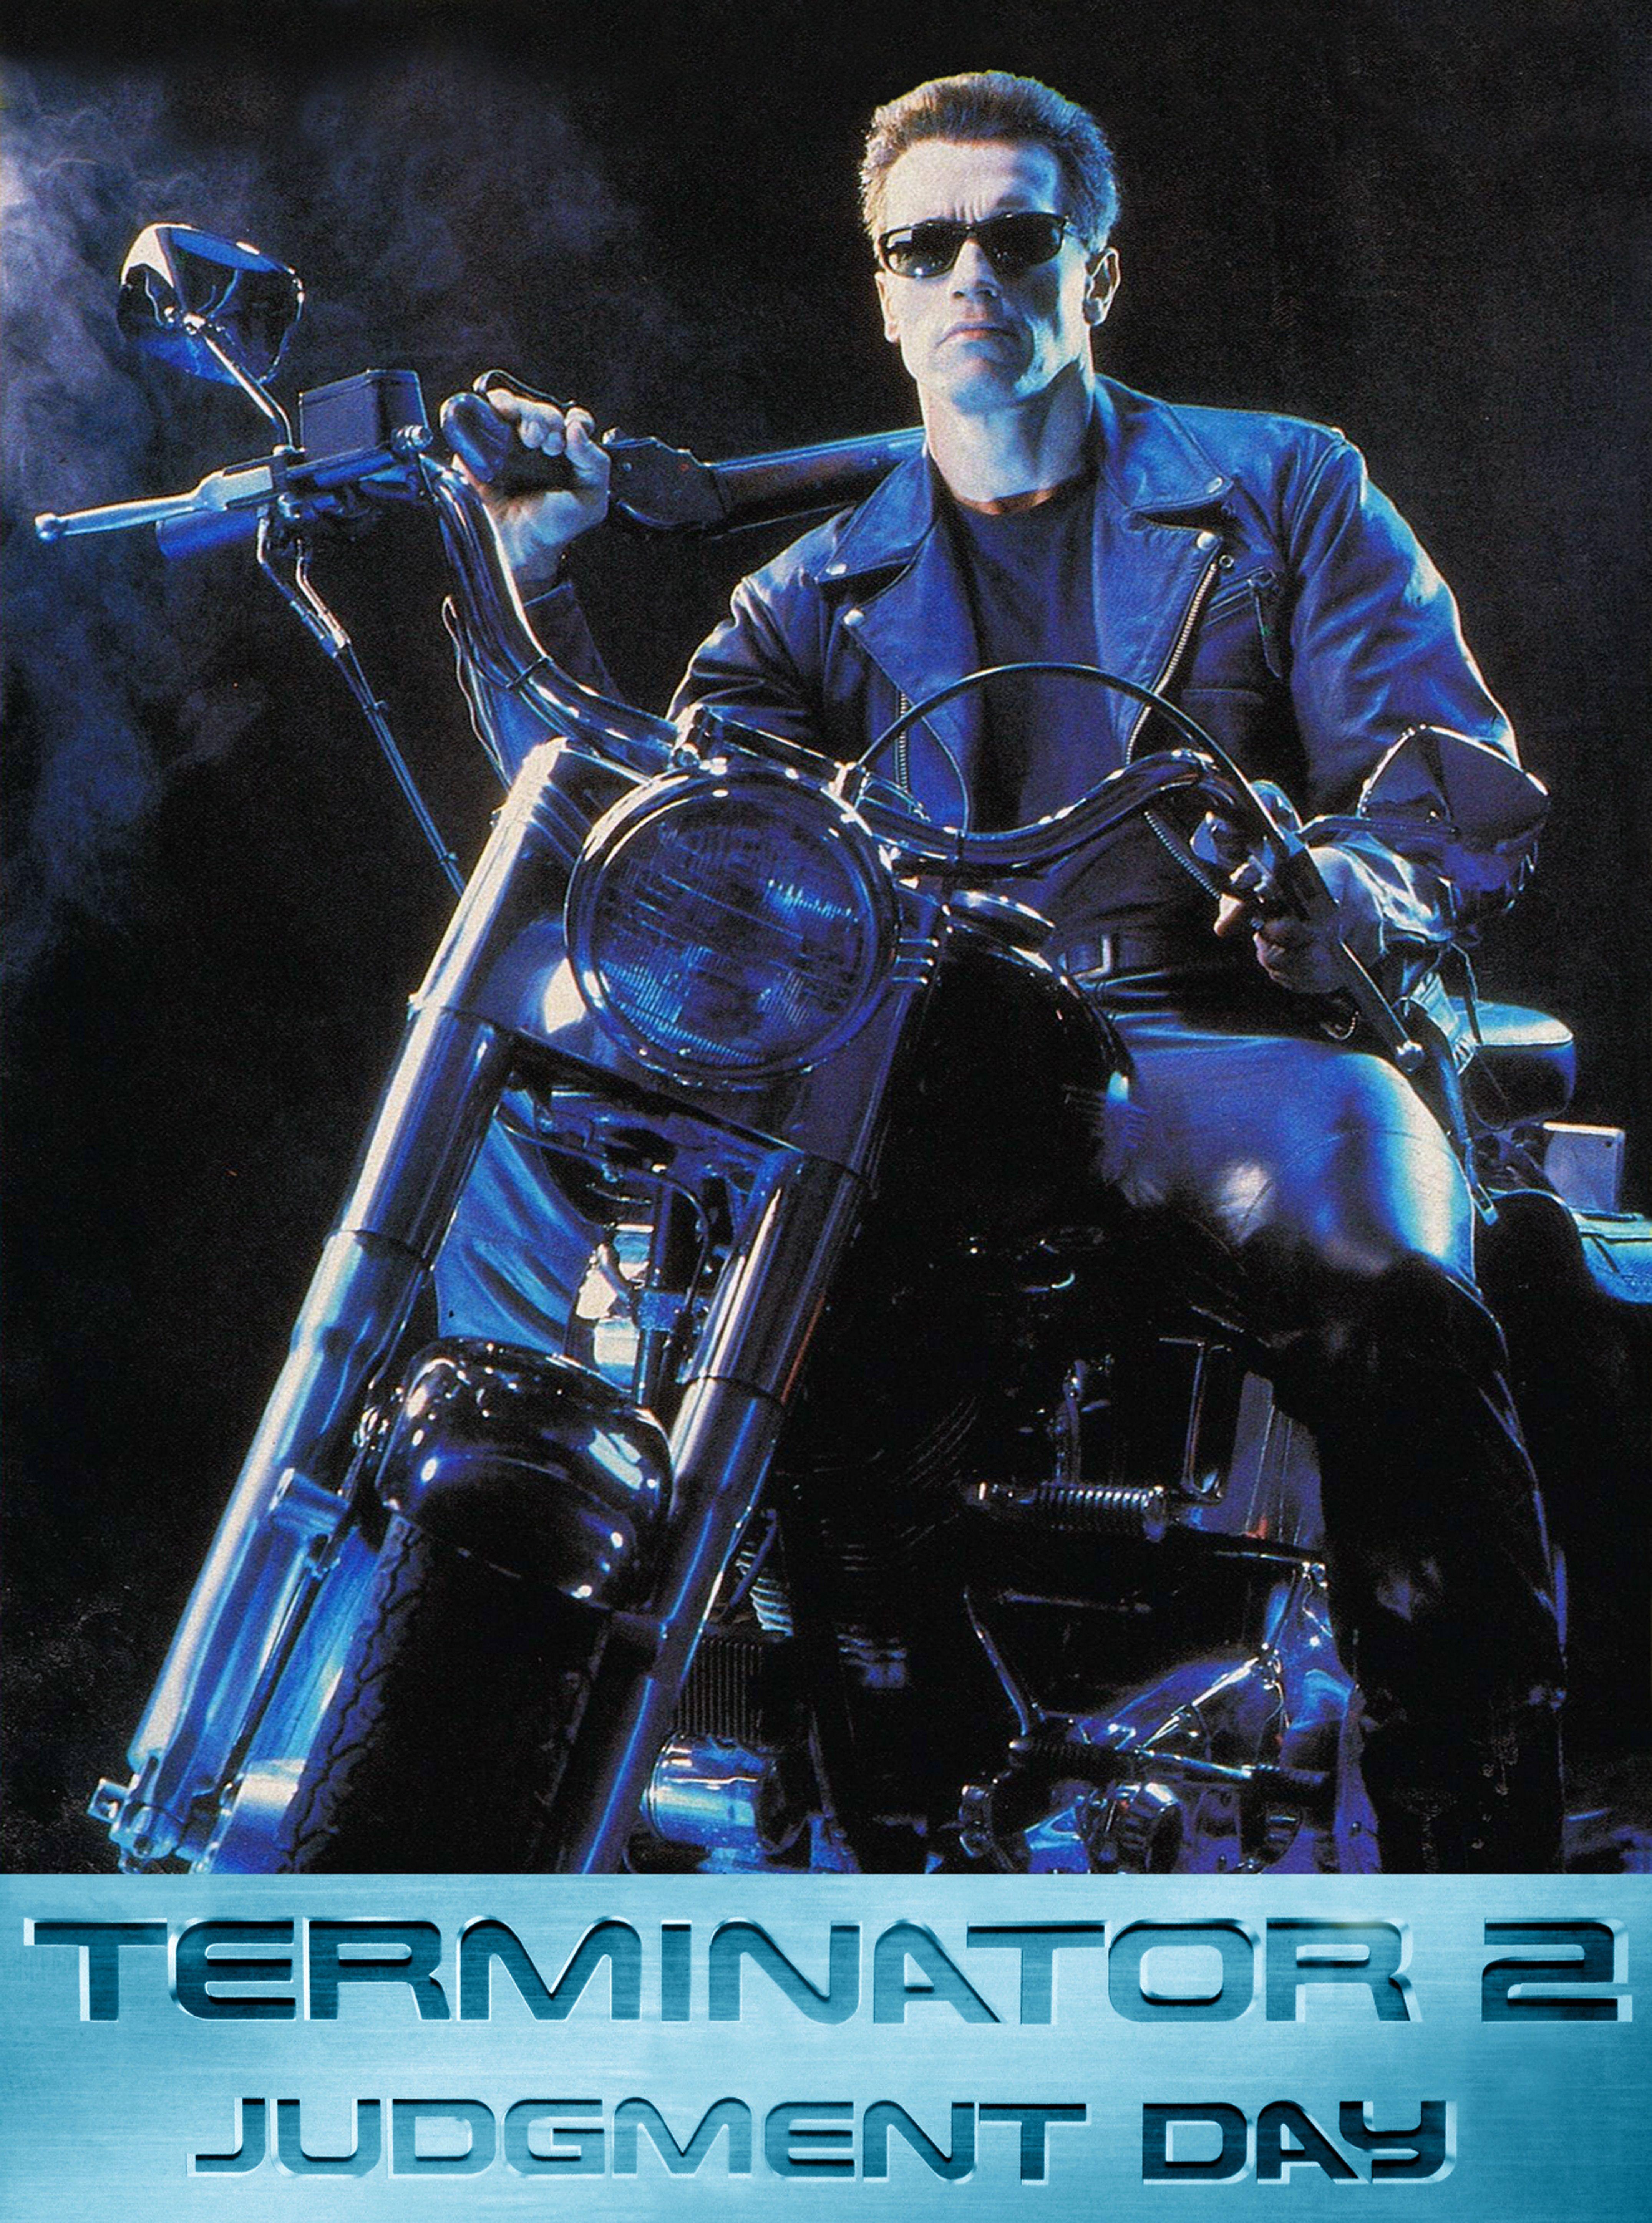 Poster Arnold Schwarzenegger Terminator 2 Judgment Day 1991 Terminator Arnold Schwarzenegger Terminator 2 Terminator Movies